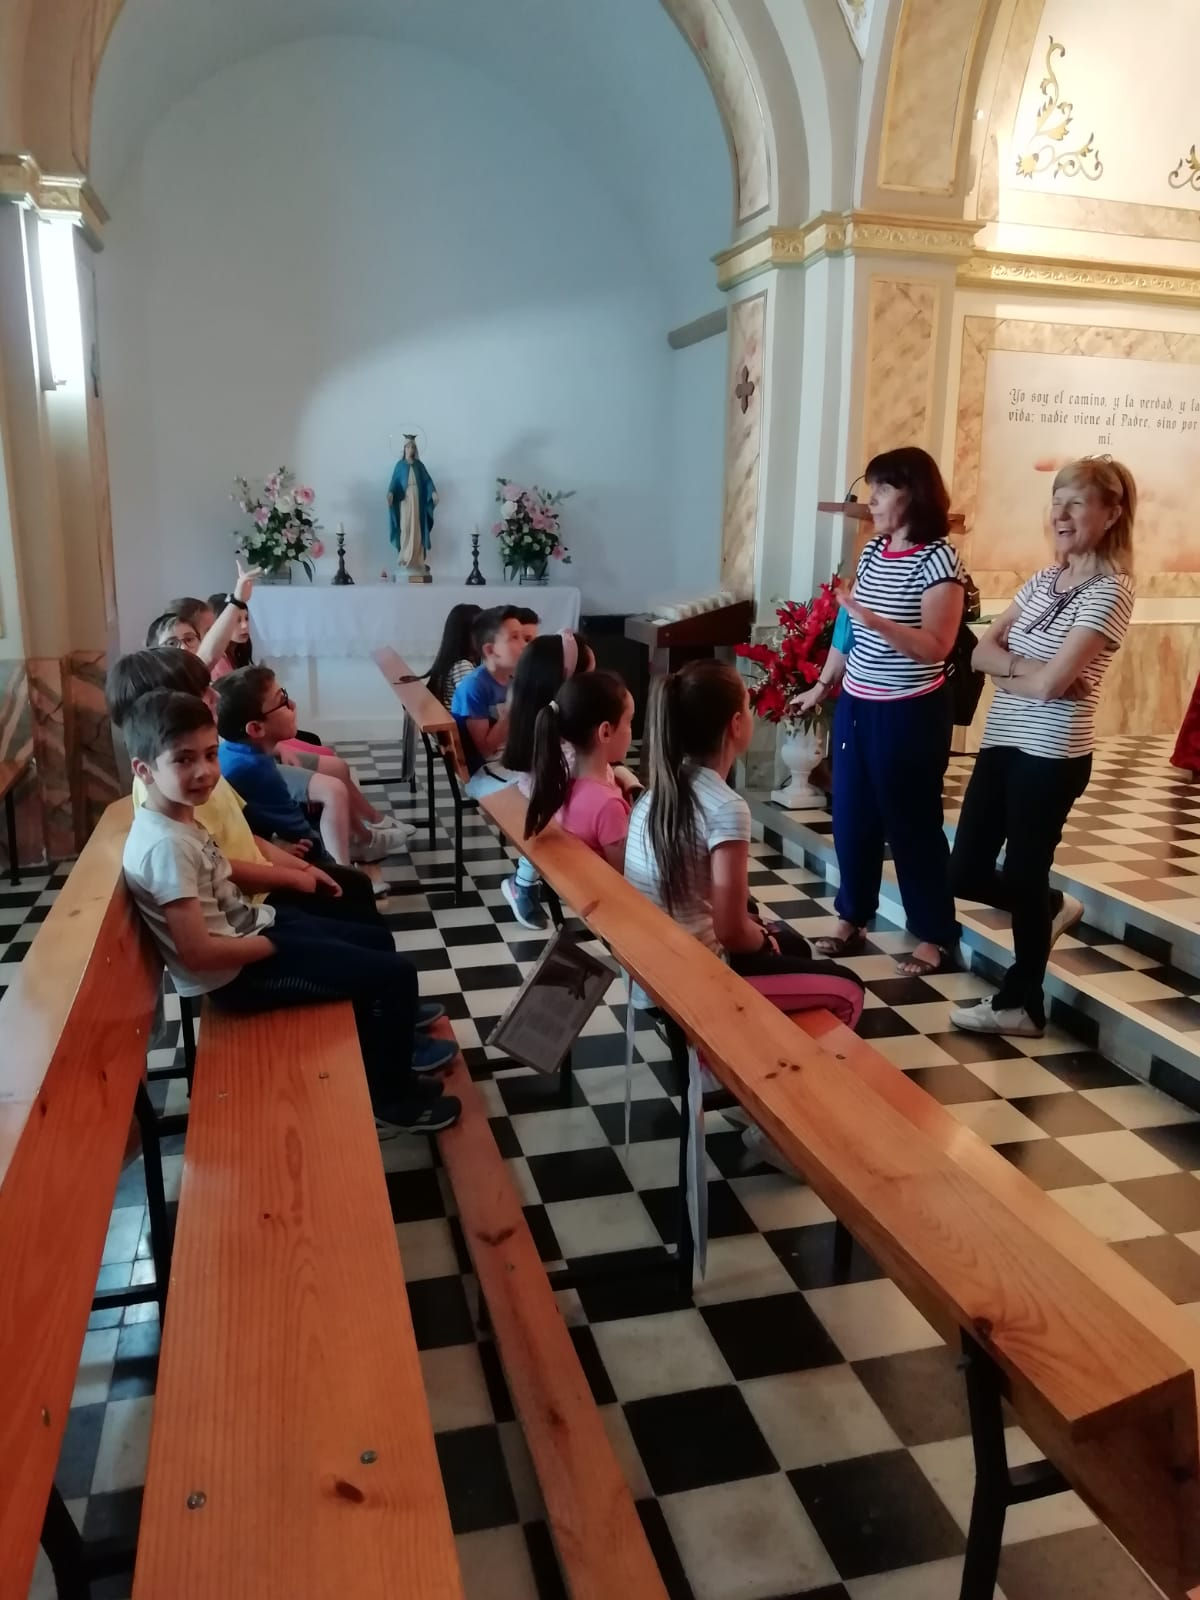 (2019-05-23) Visita ermita alumnos Laura - 3 C primaria - Reina Sofia - María Isabel Berenguer (05)